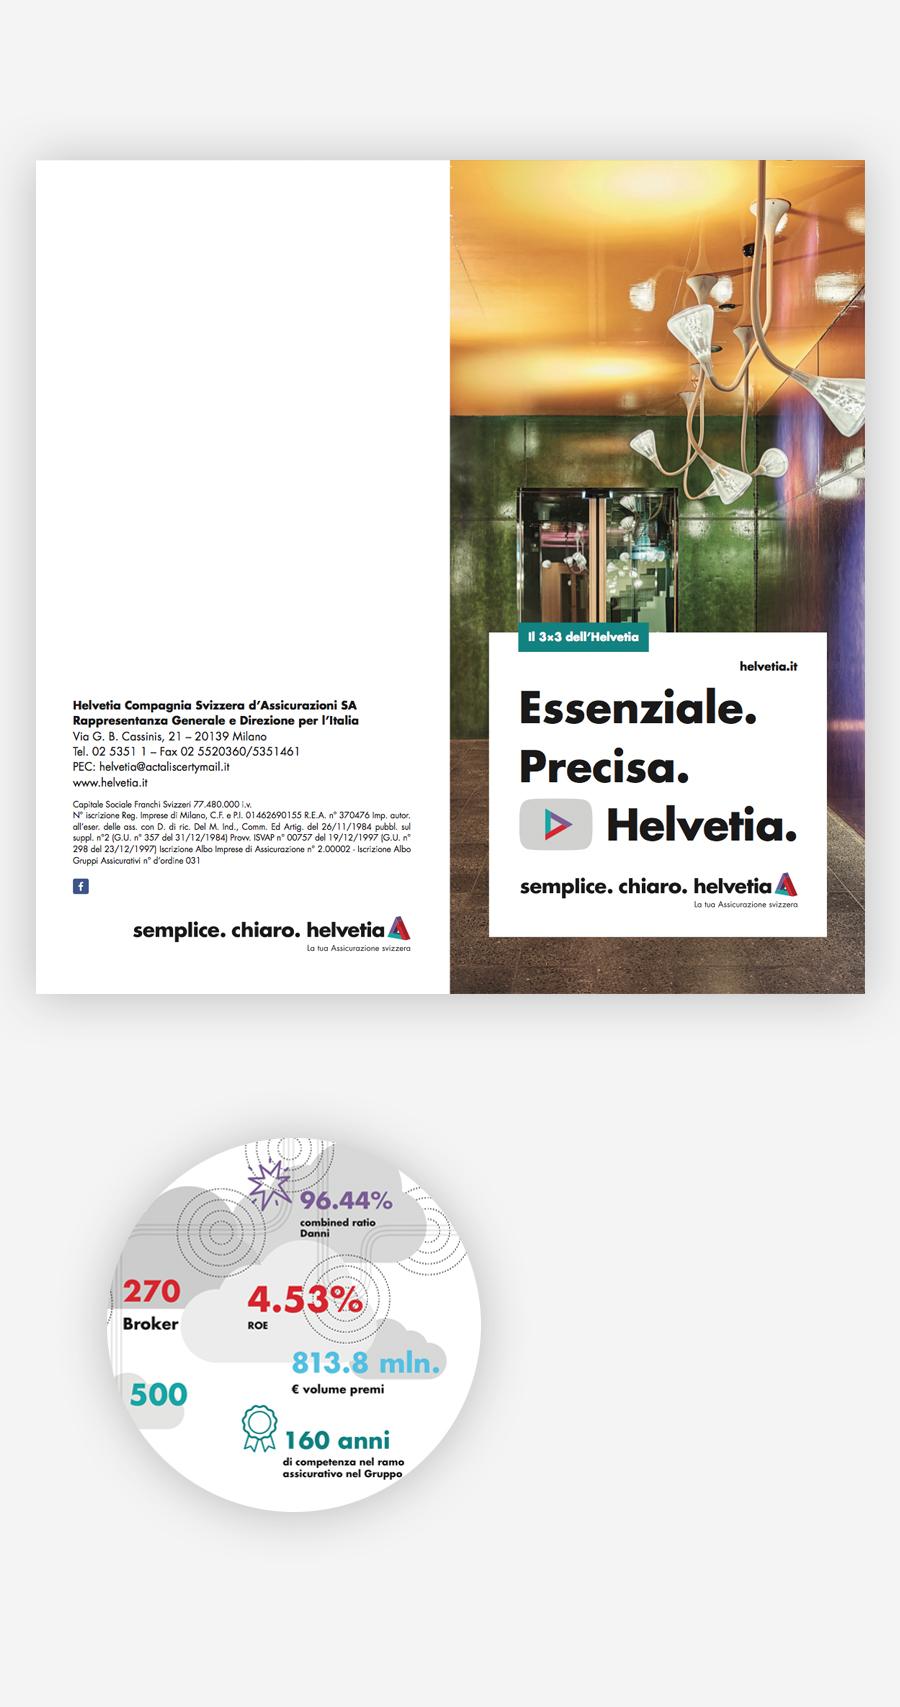 Gruppo Helvetia